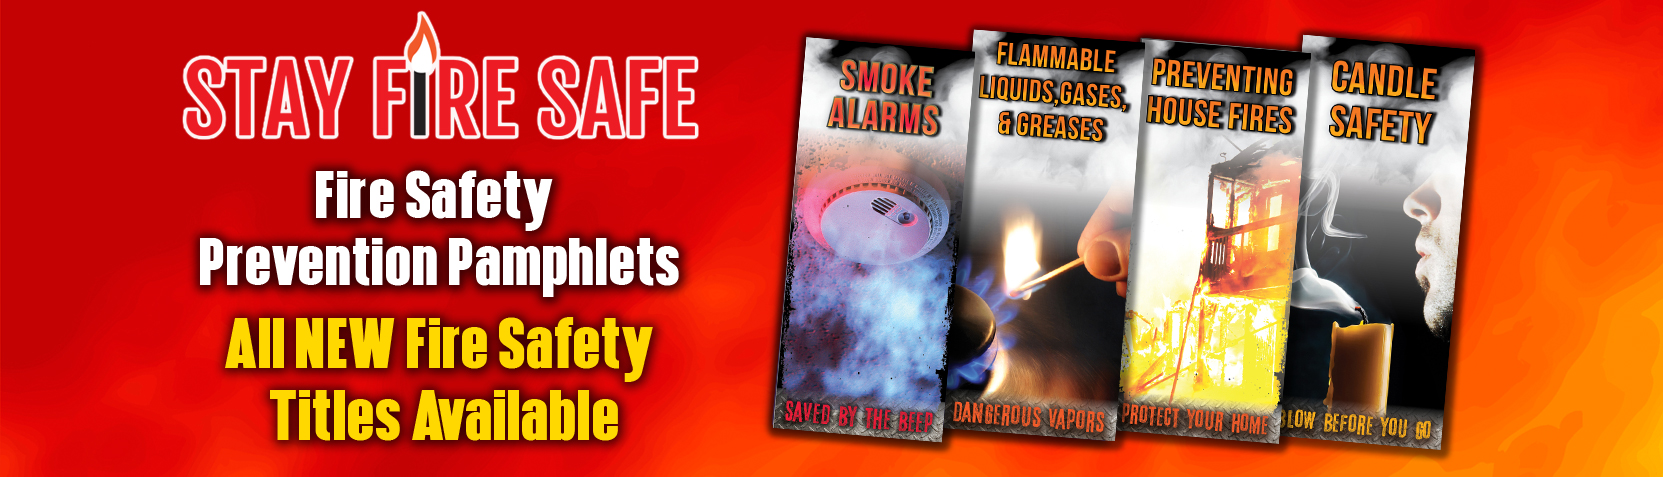 Fire-Safety-PAMPHLETS--WEB-Banner